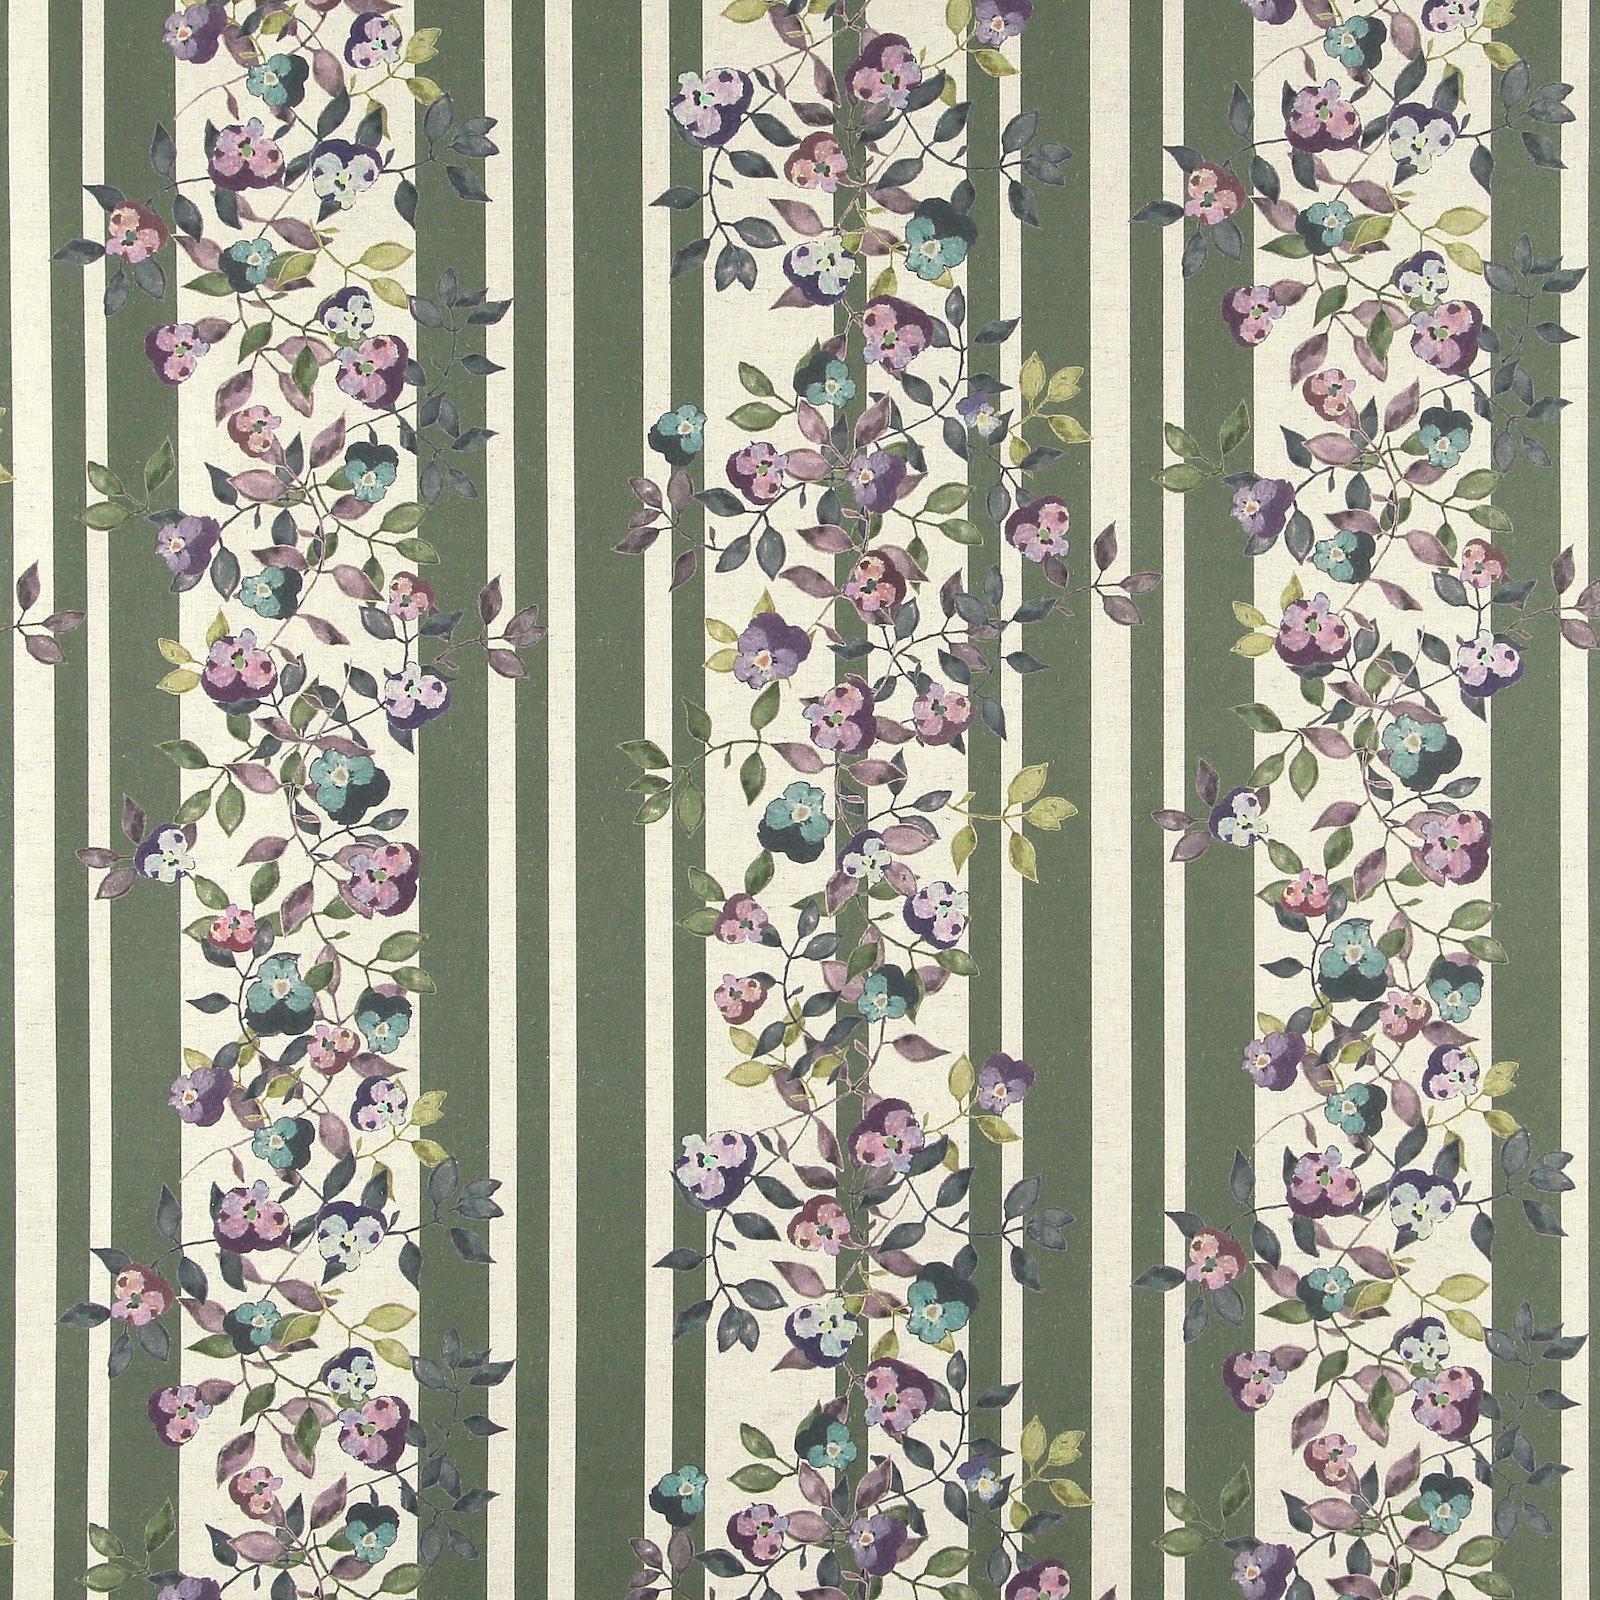 Woven cotton/linen green/rose w flowers 780576_pack_sp